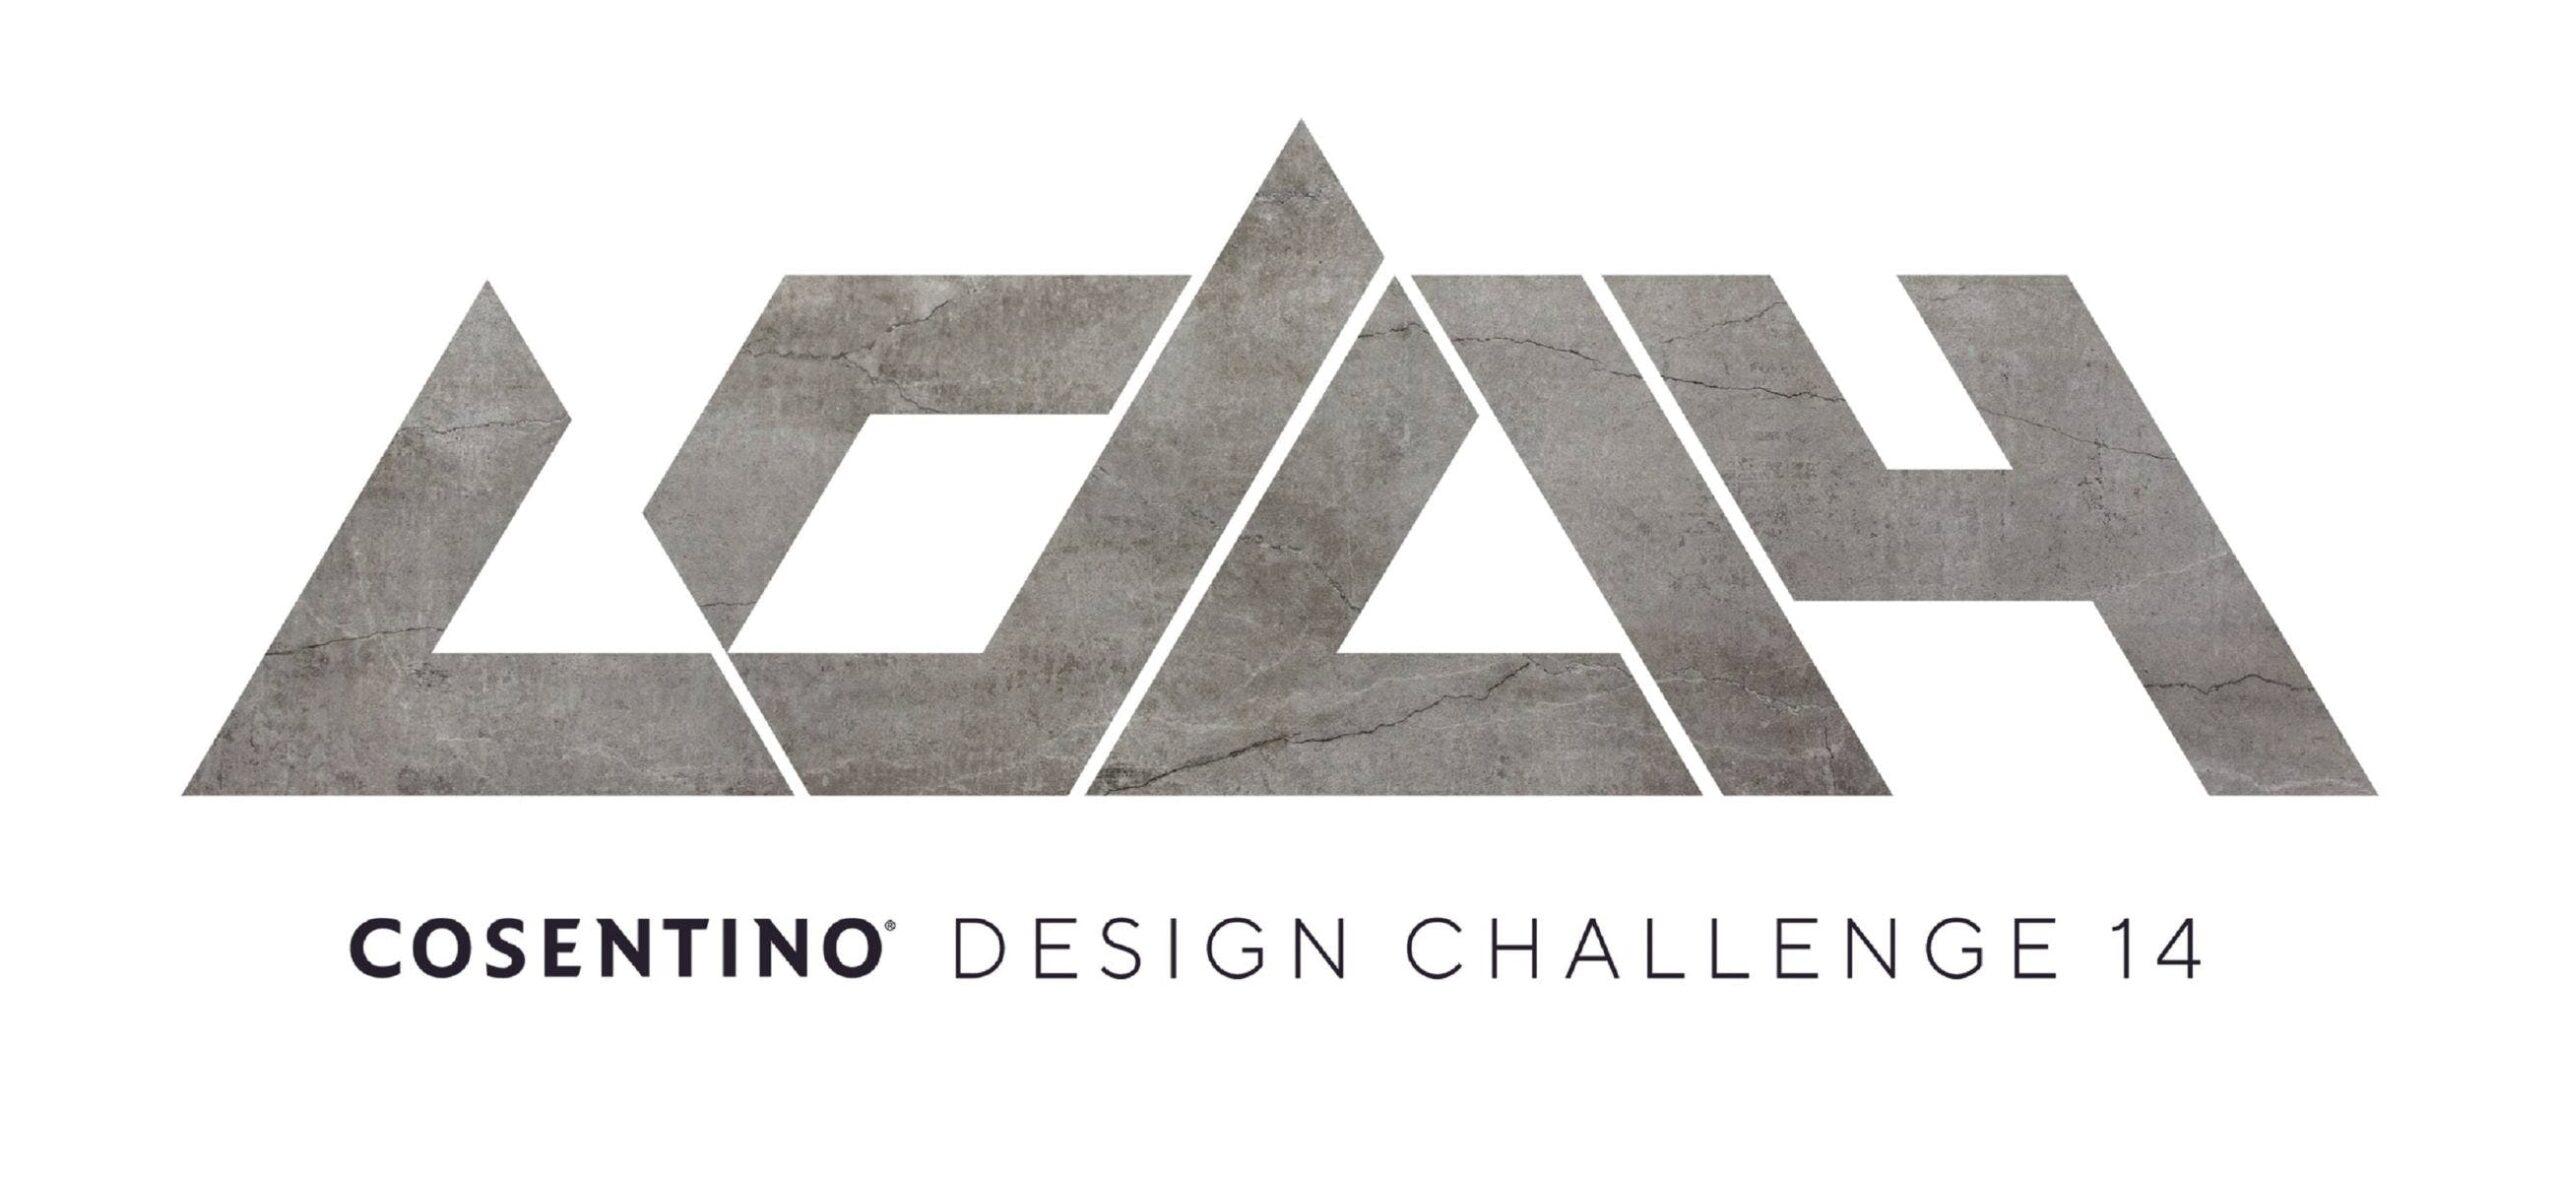 Image of Cosentino design Challenge afis 2 scaled in Cosentino Design Challenge 14 is extending its deadlines - Cosentino